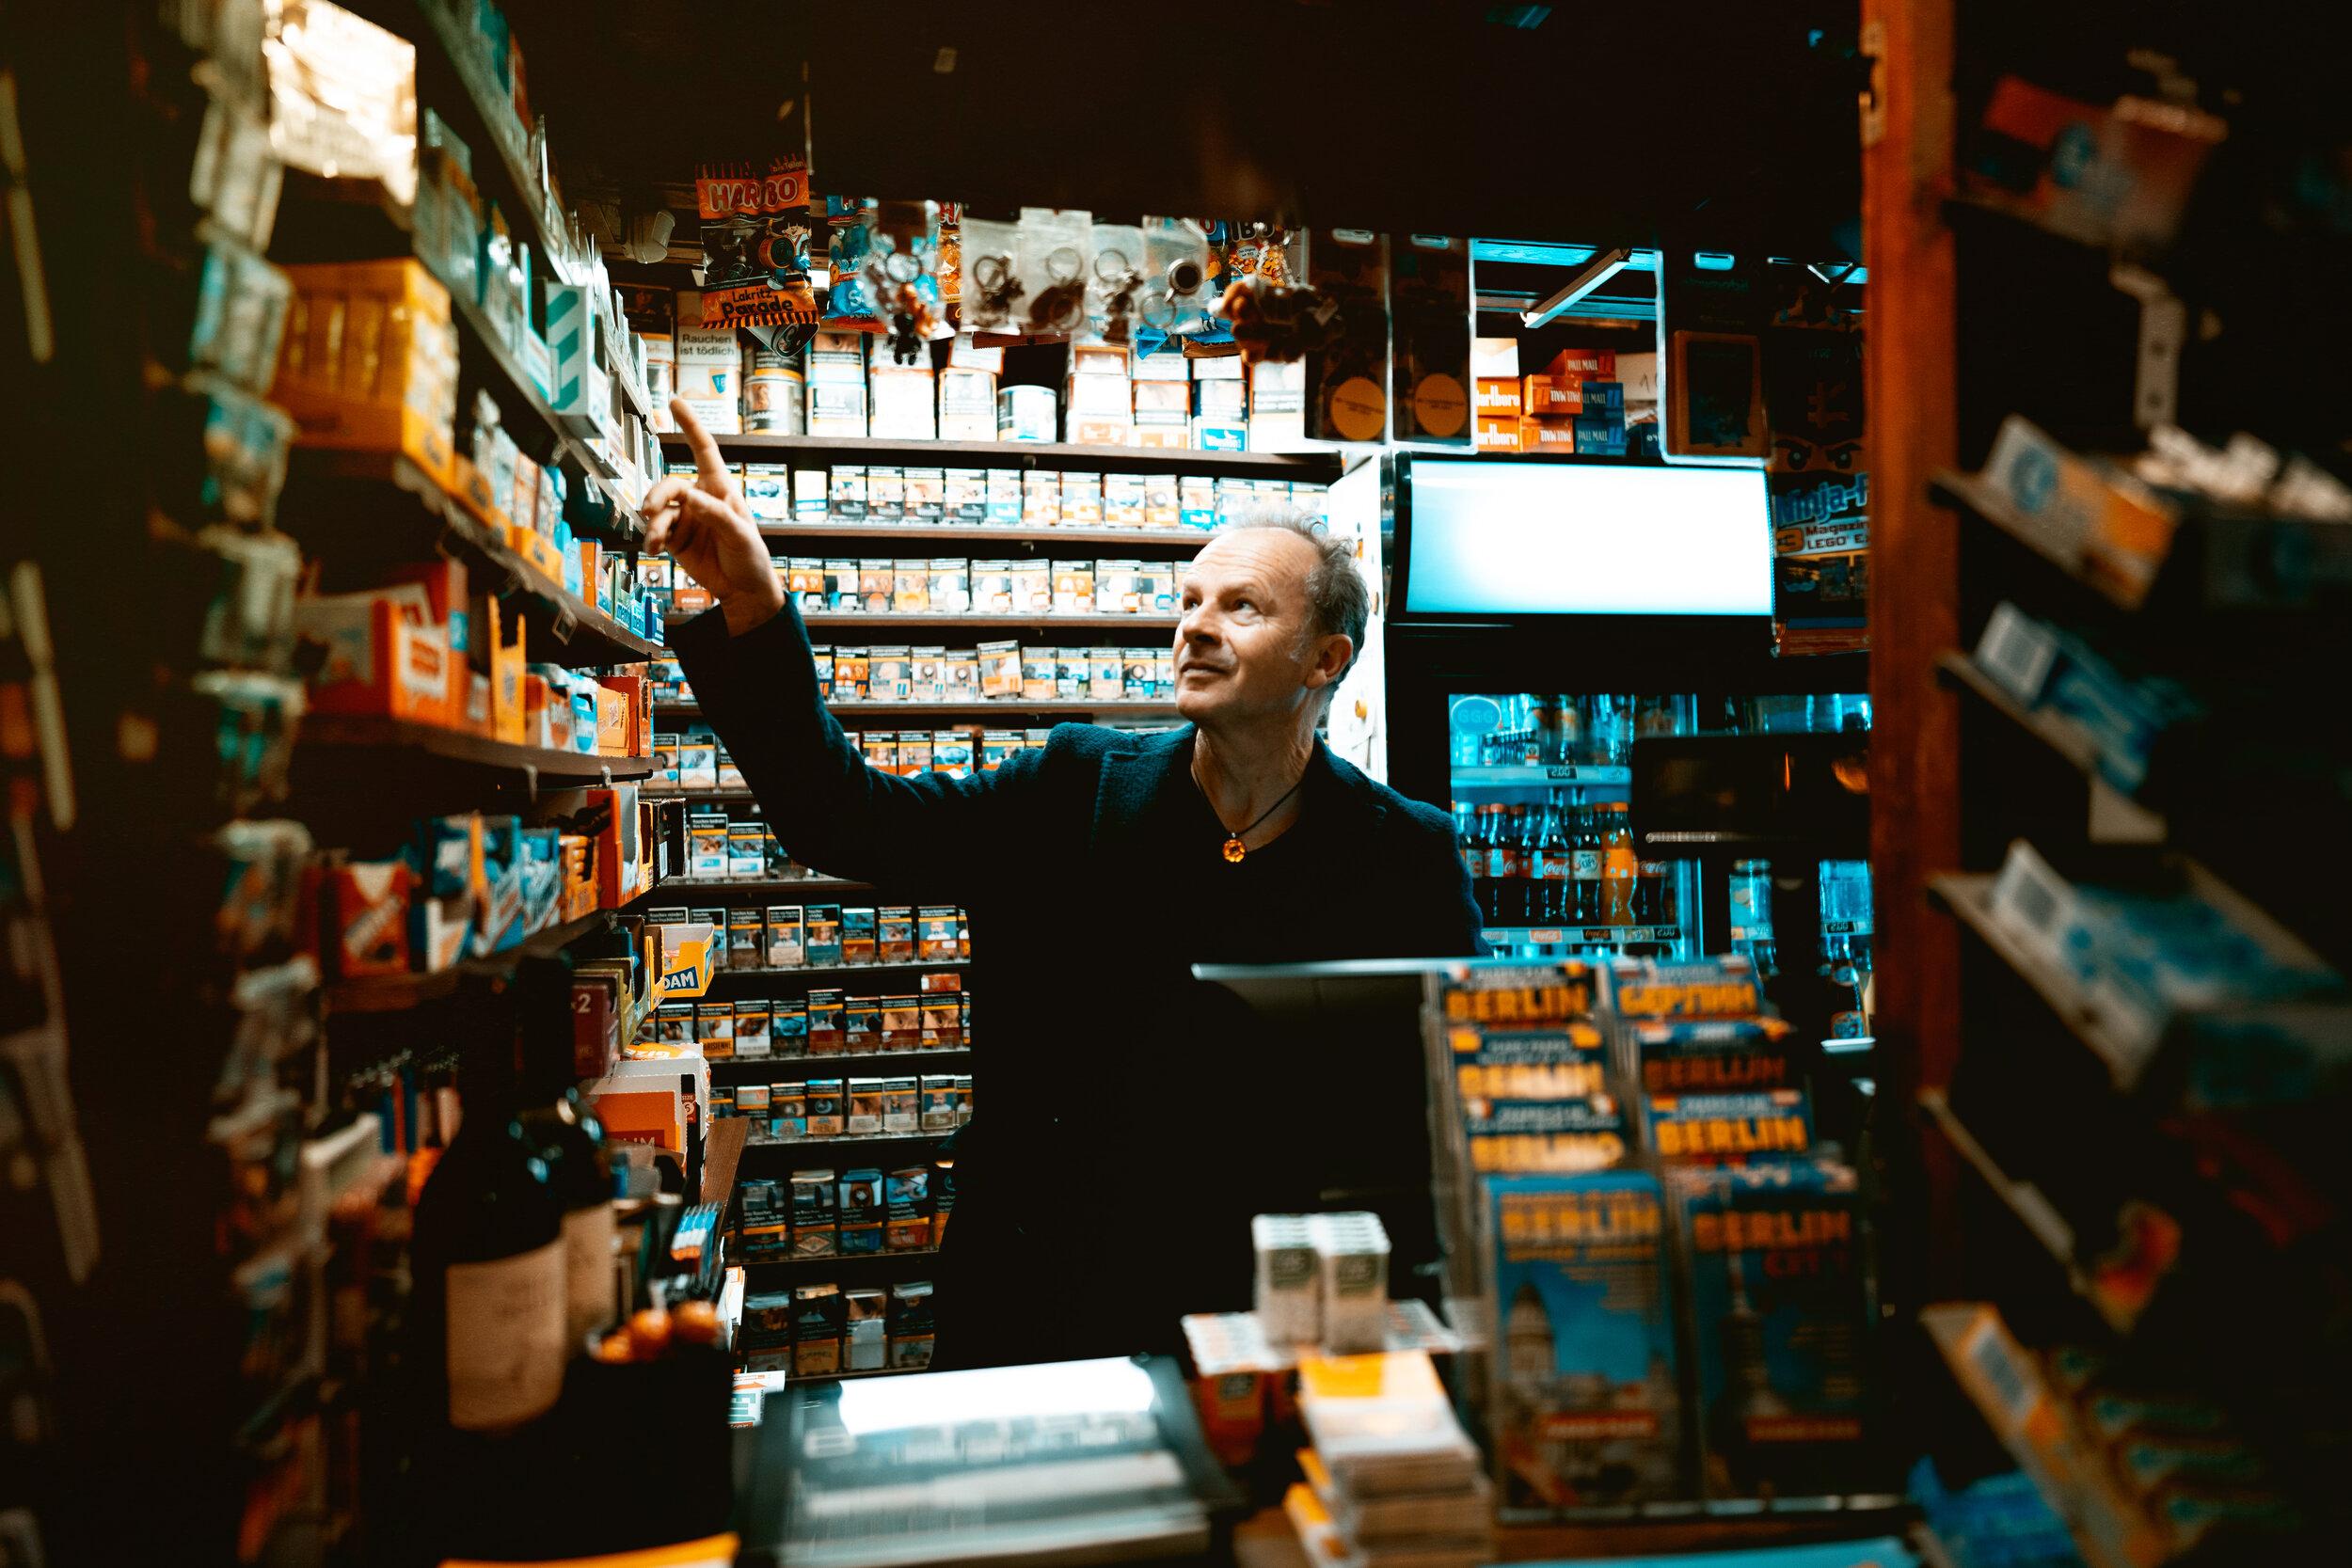 Willy Astor 2 www.christophbombart-photography.com.jpg